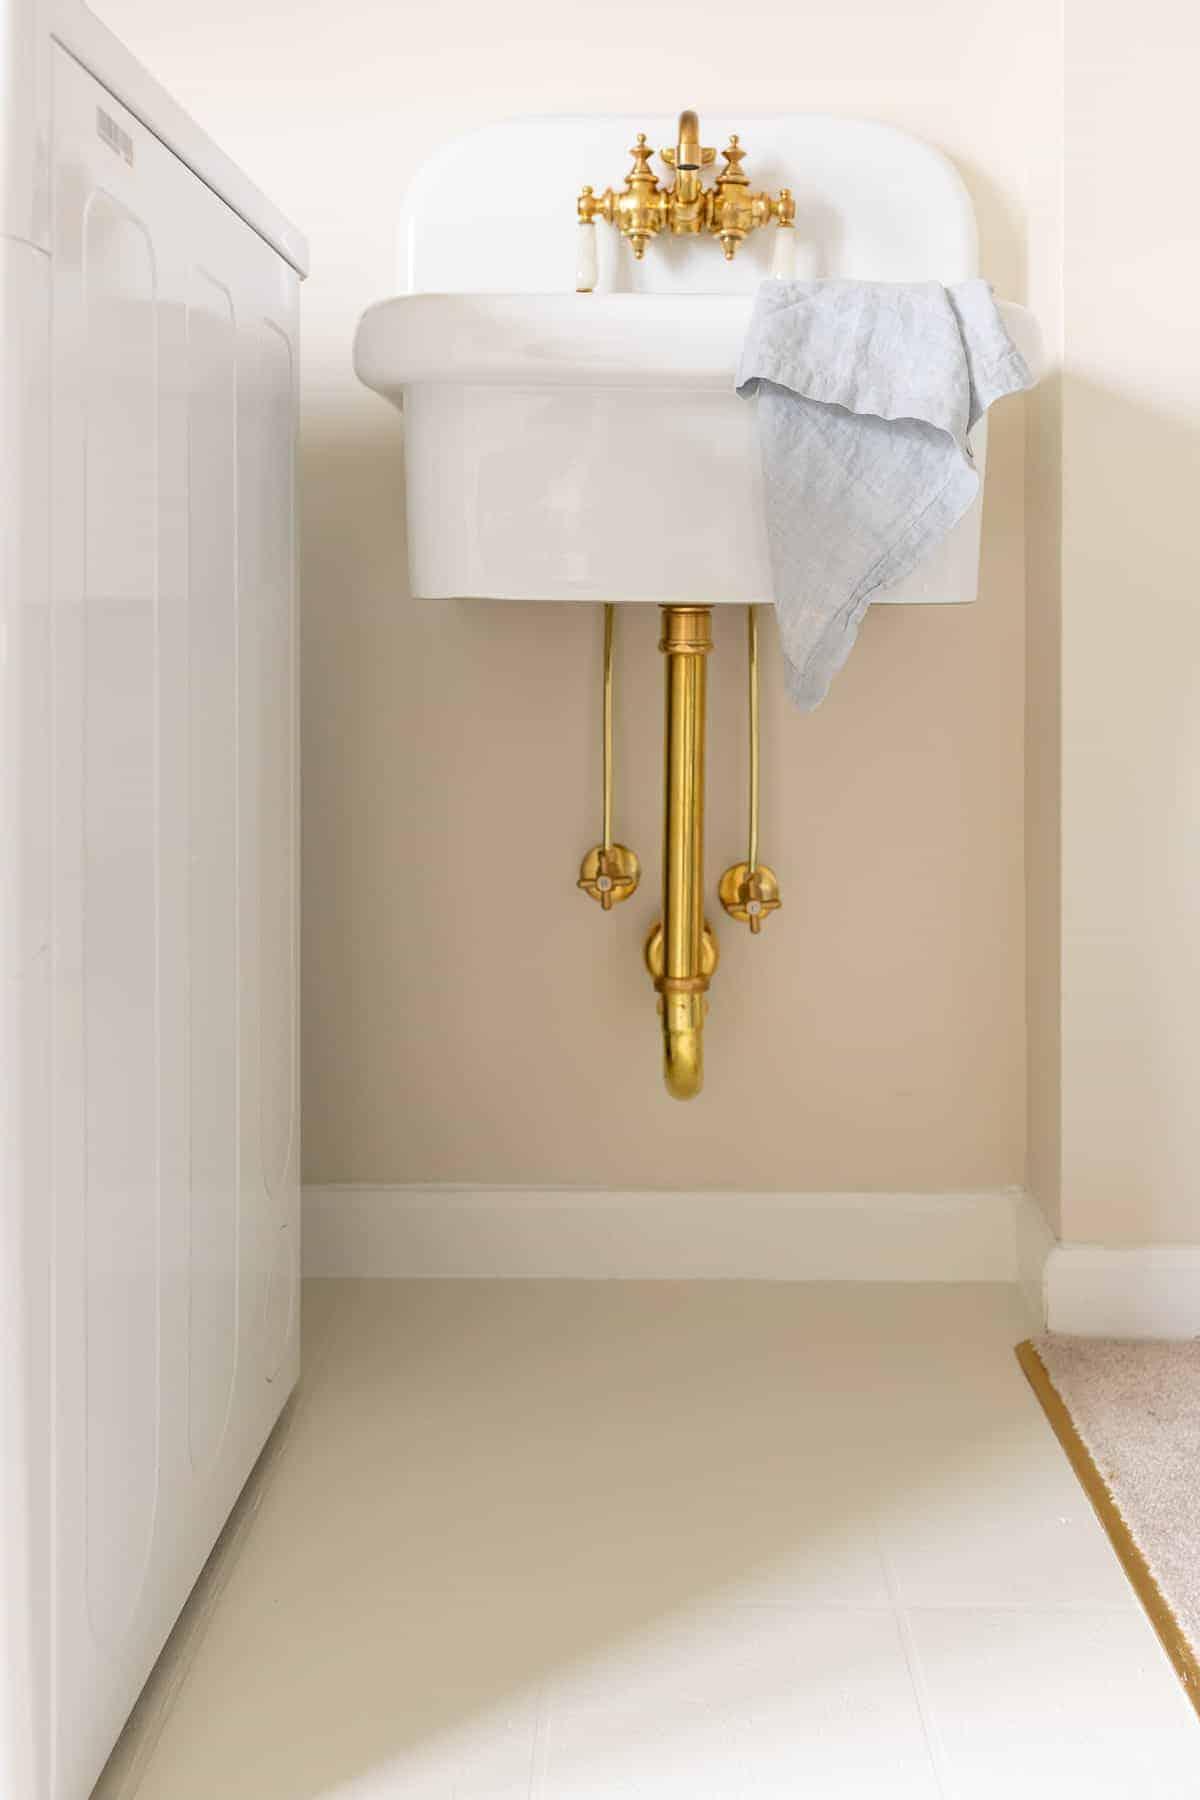 laundry room sink and painted linoleum floor